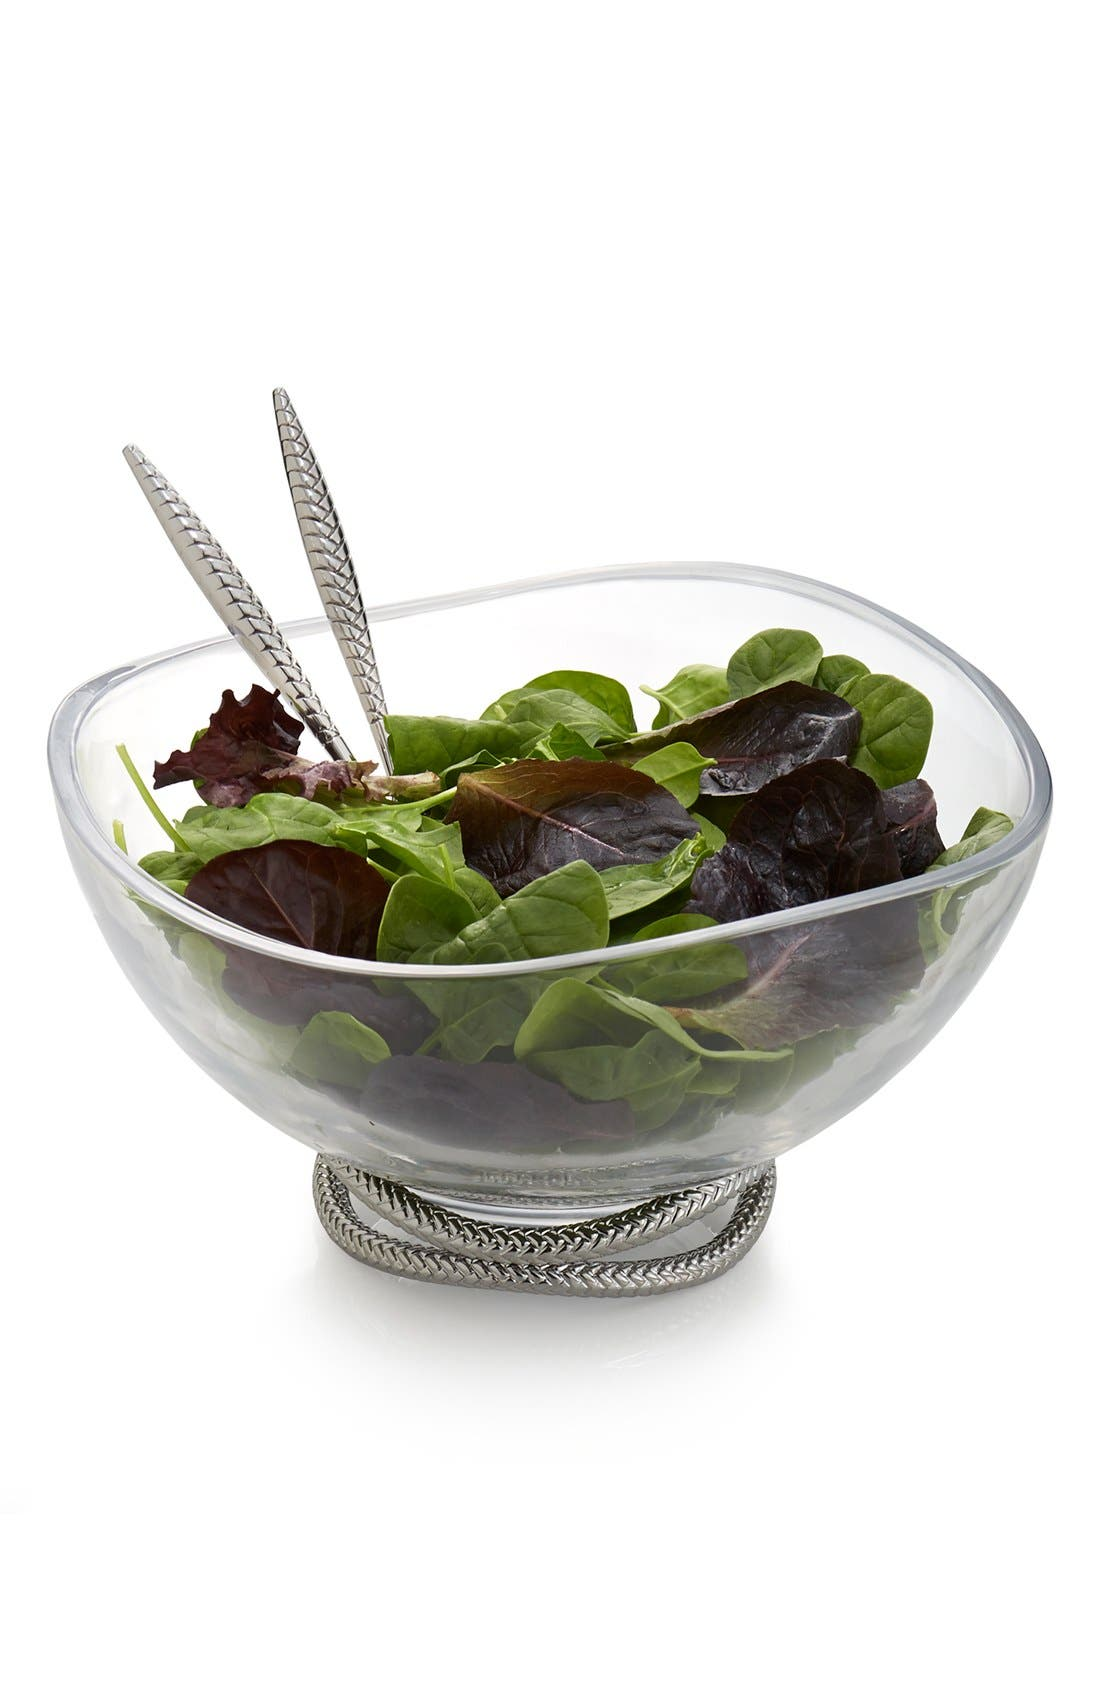 Alternate Image 1 Selected - Nambé 'Braid' Glass Salad Bowl & Servers